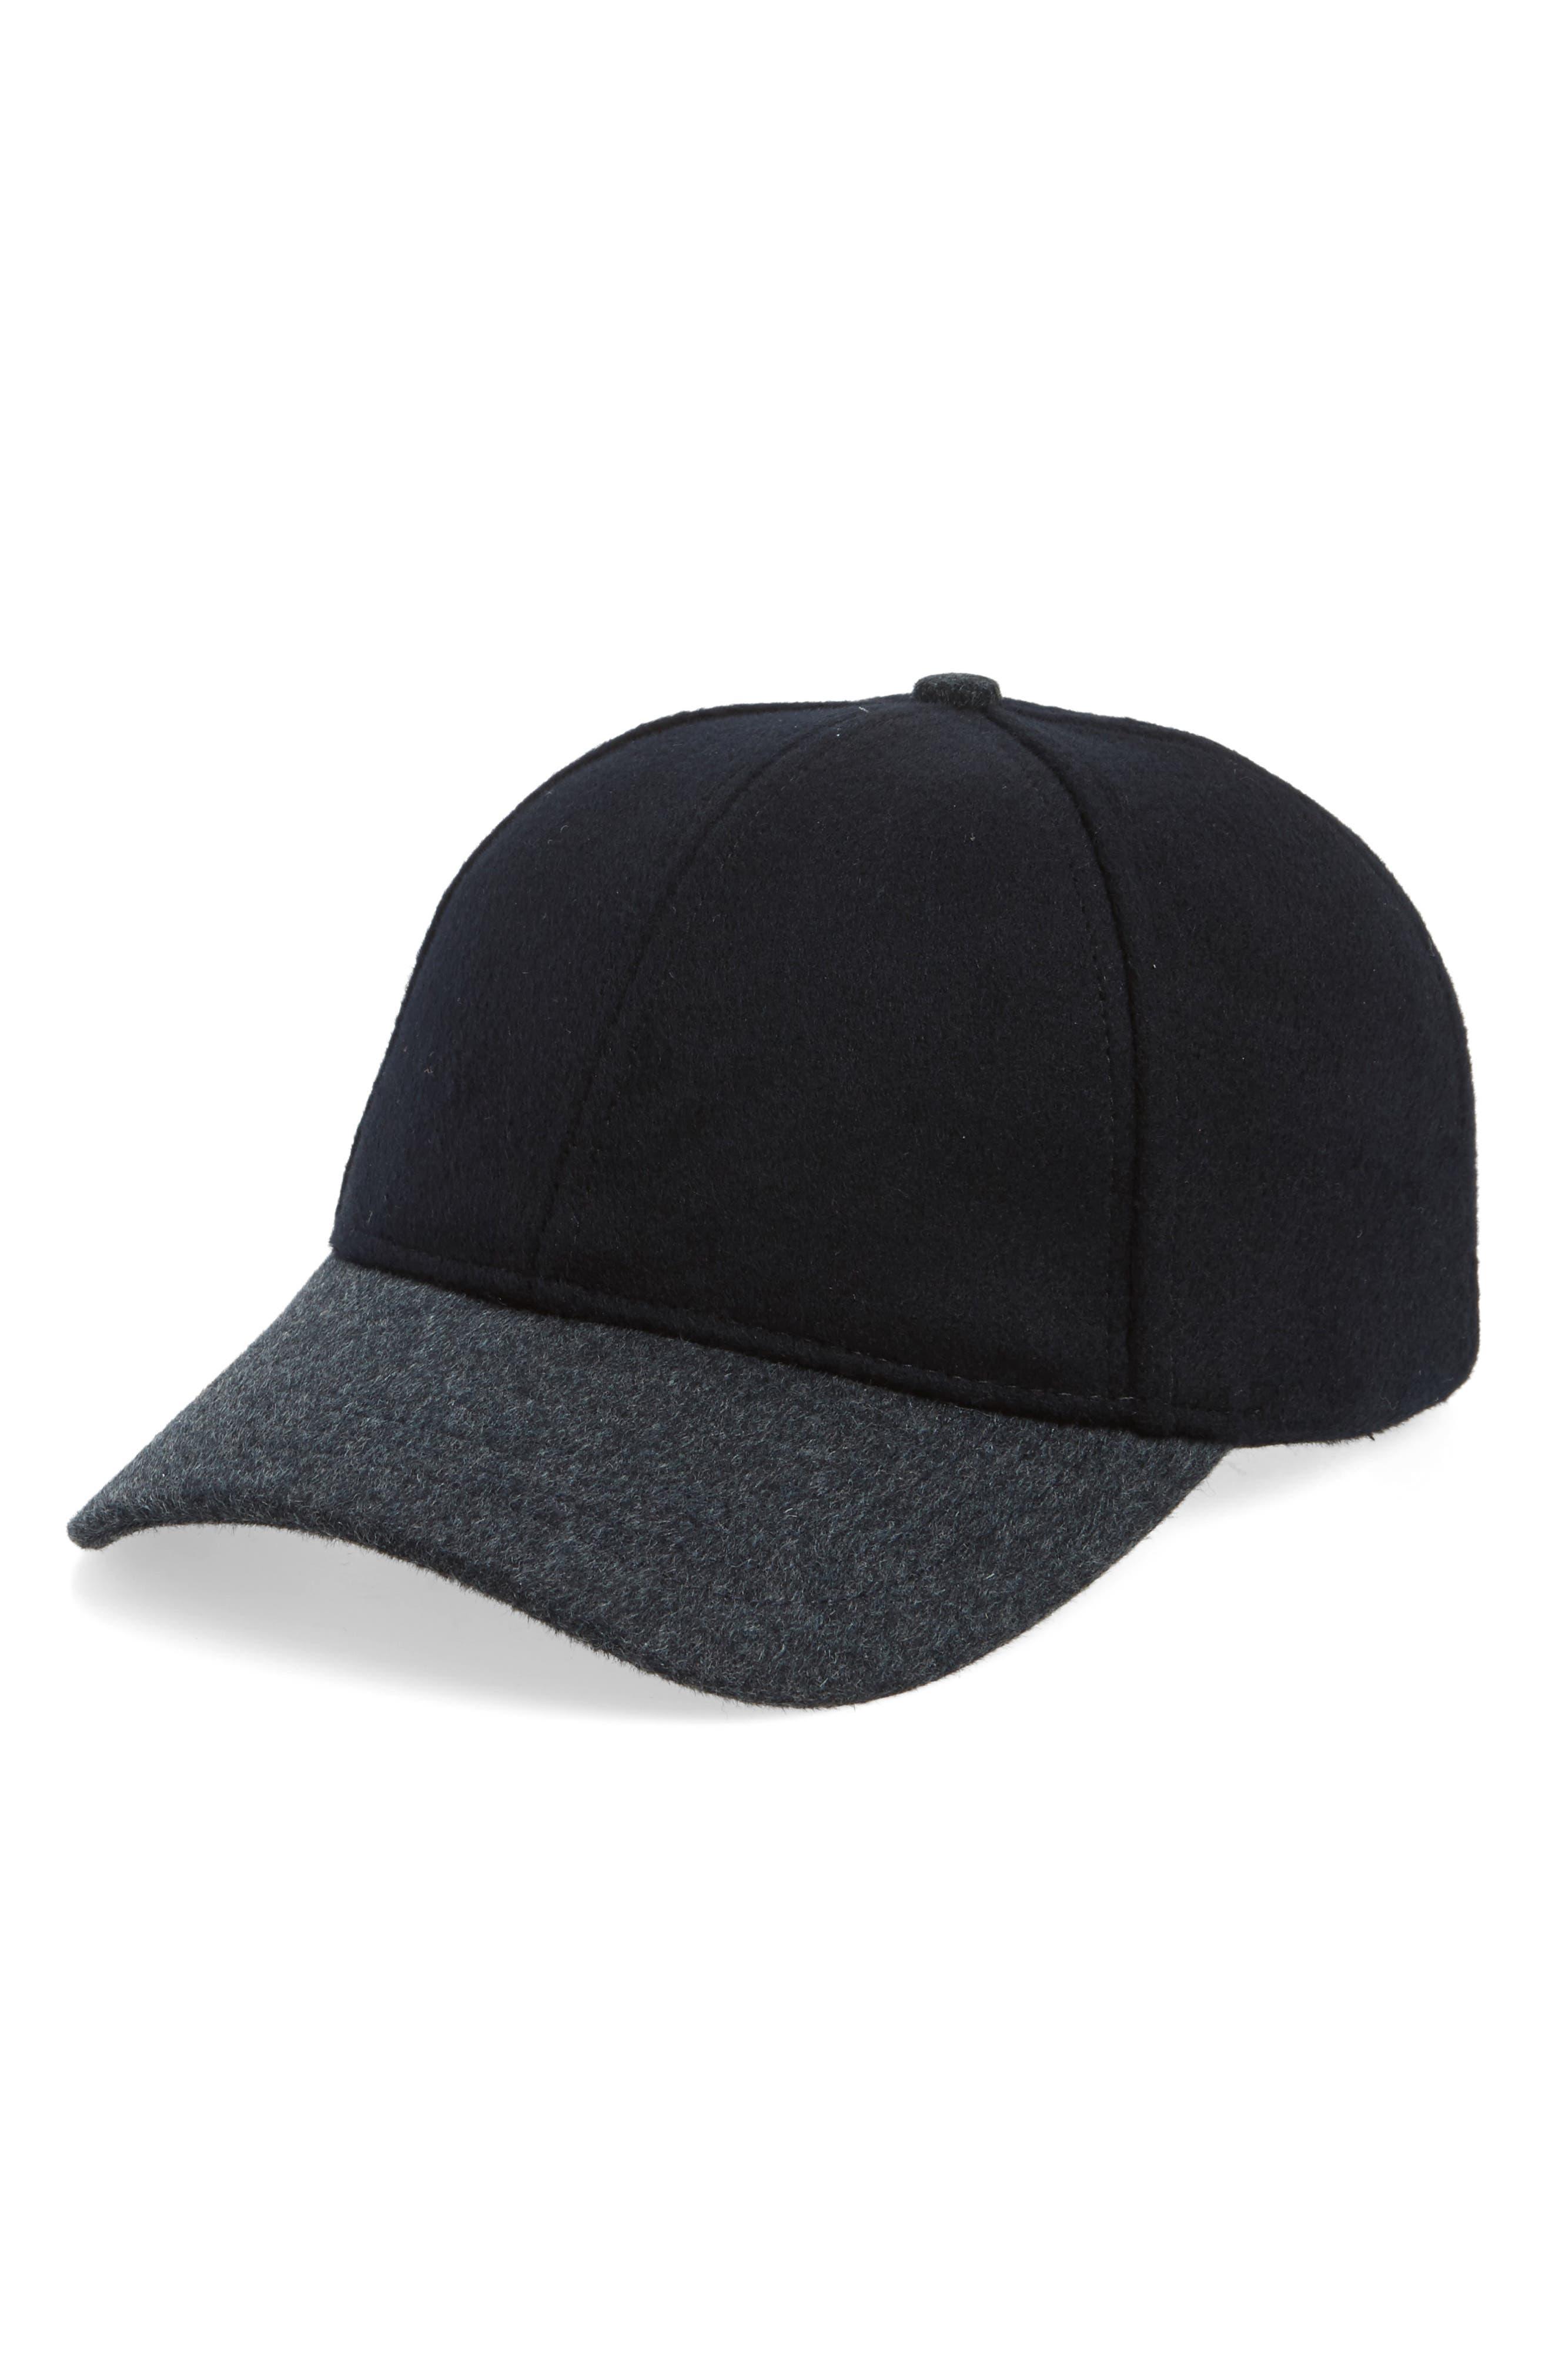 Main Image - Sole Society Two-Tone Baseball Cap